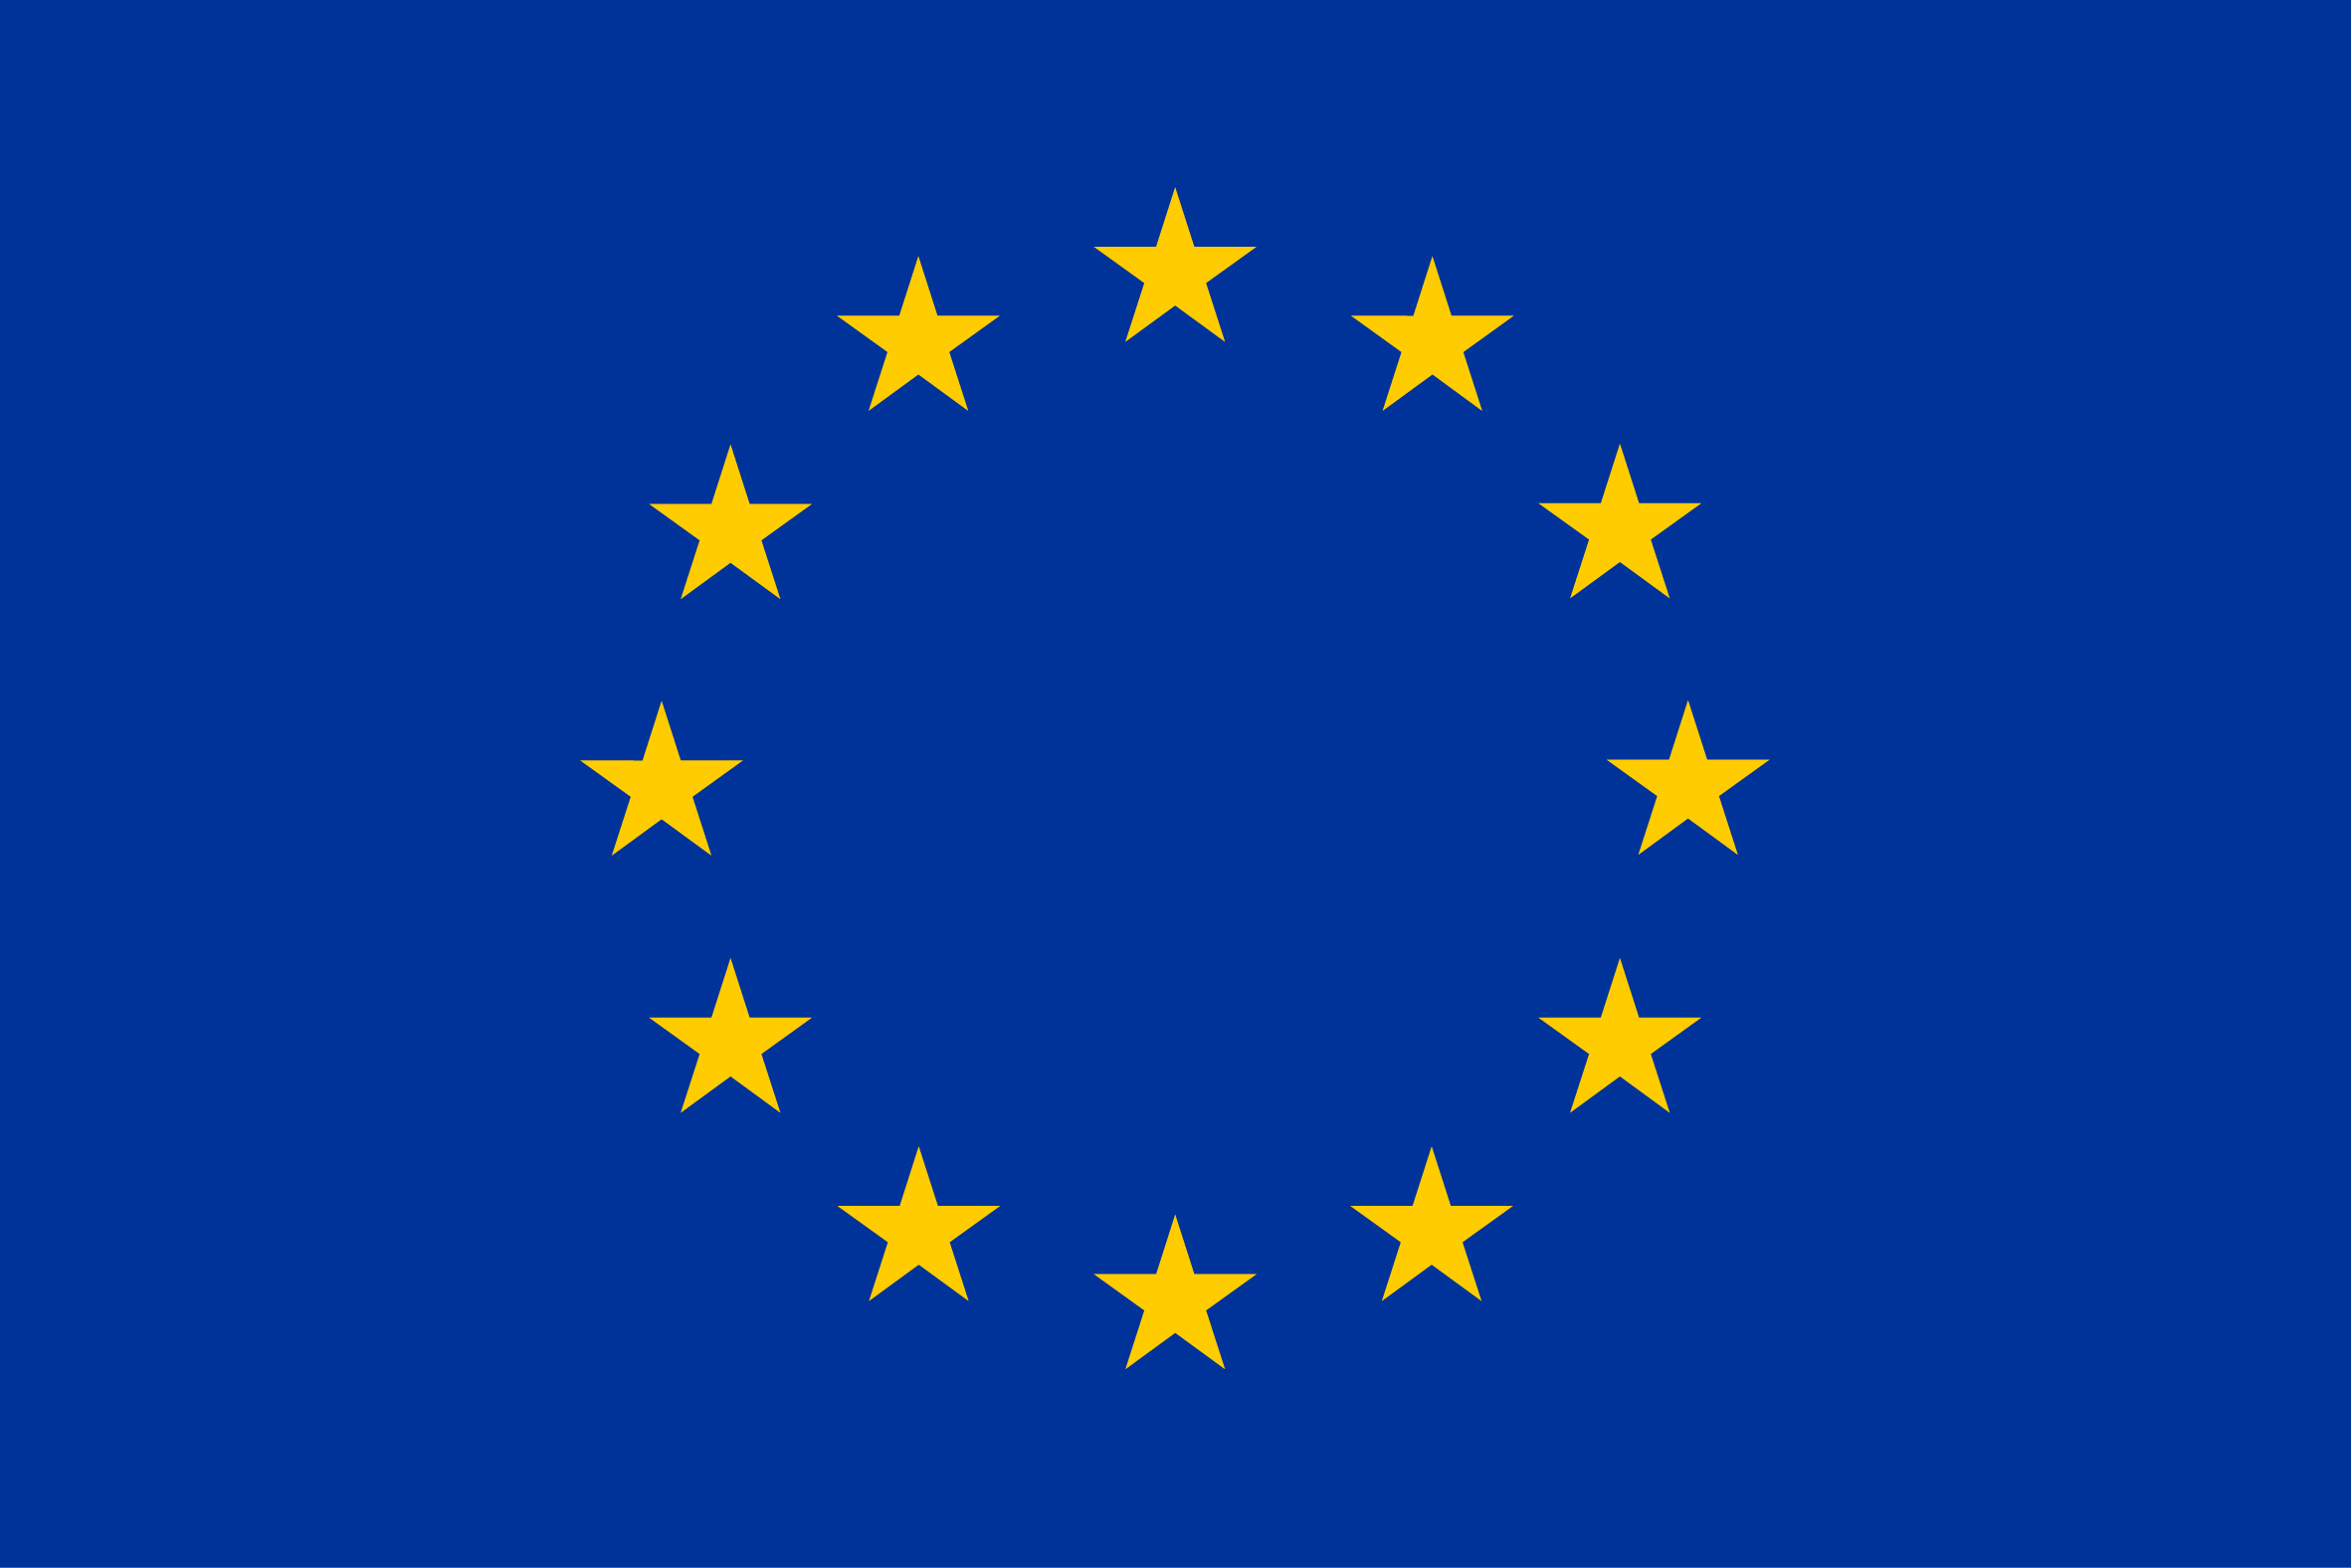 eu_flag_yellow_high.jpg